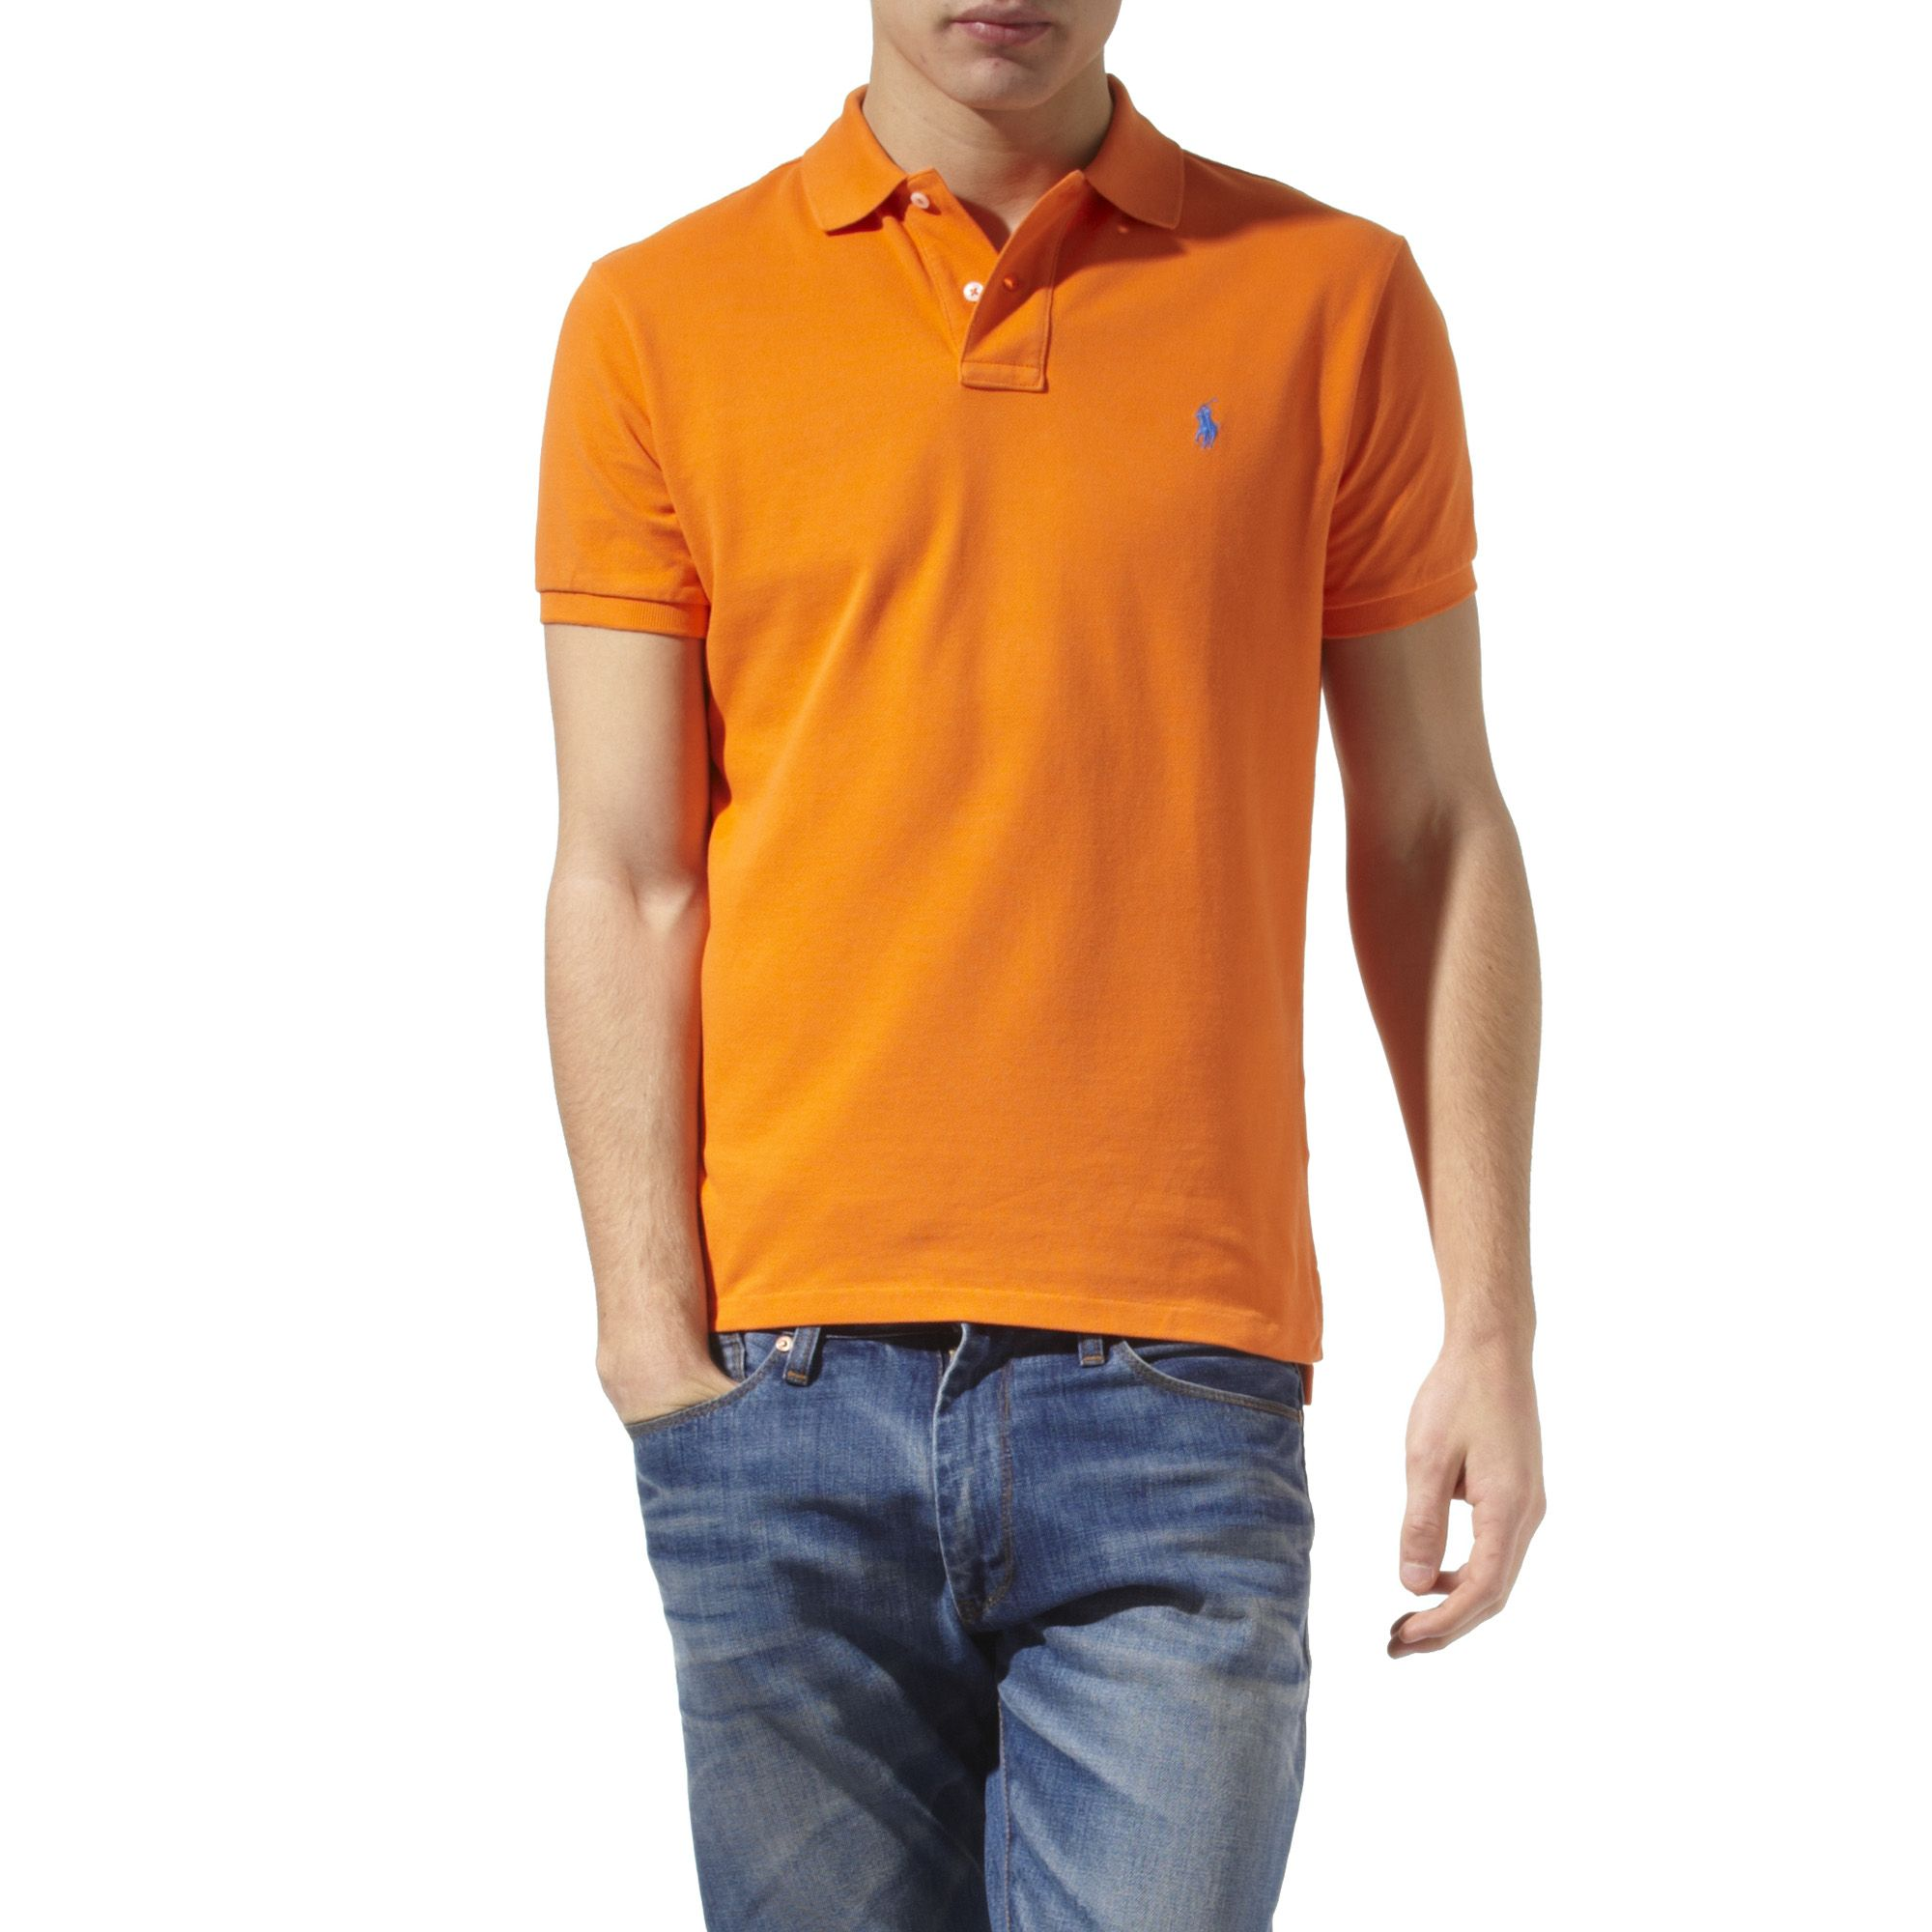 ralph lauren slim fit polo shirt in orange for men lyst. Black Bedroom Furniture Sets. Home Design Ideas